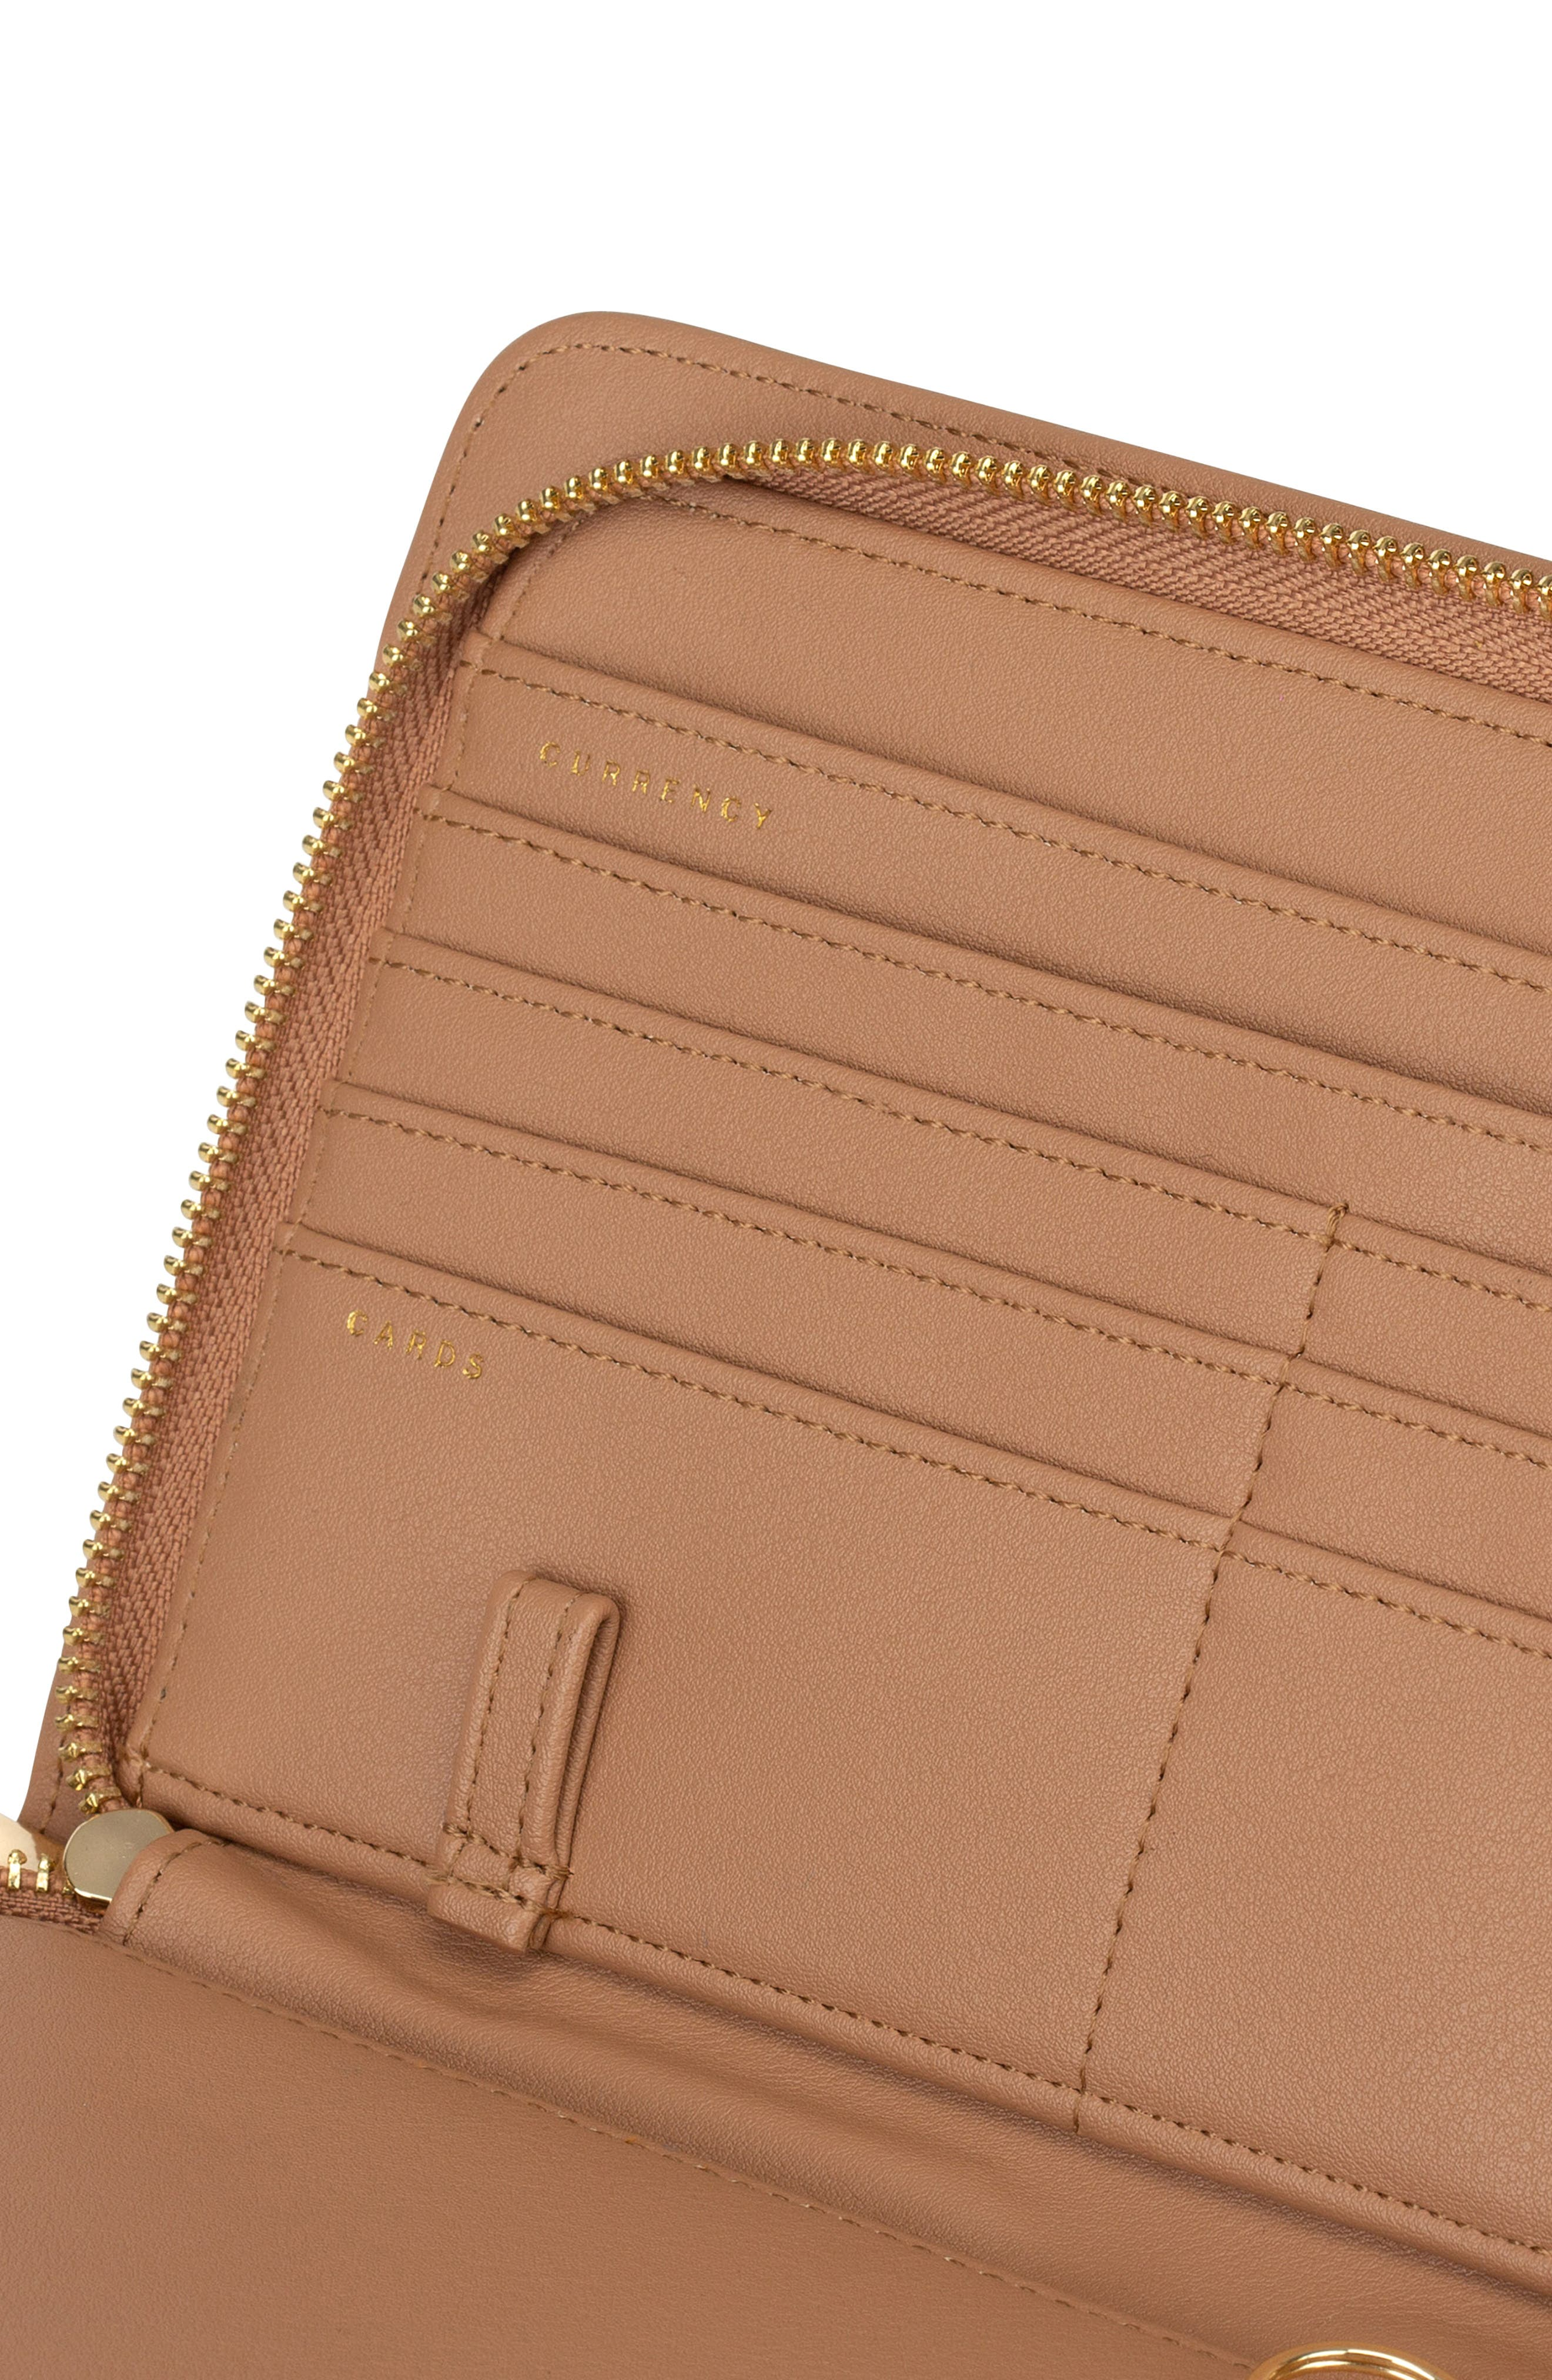 CALPAK, Faux Leather RFID Travel Wallet, Alternate thumbnail 6, color, CARAMEL